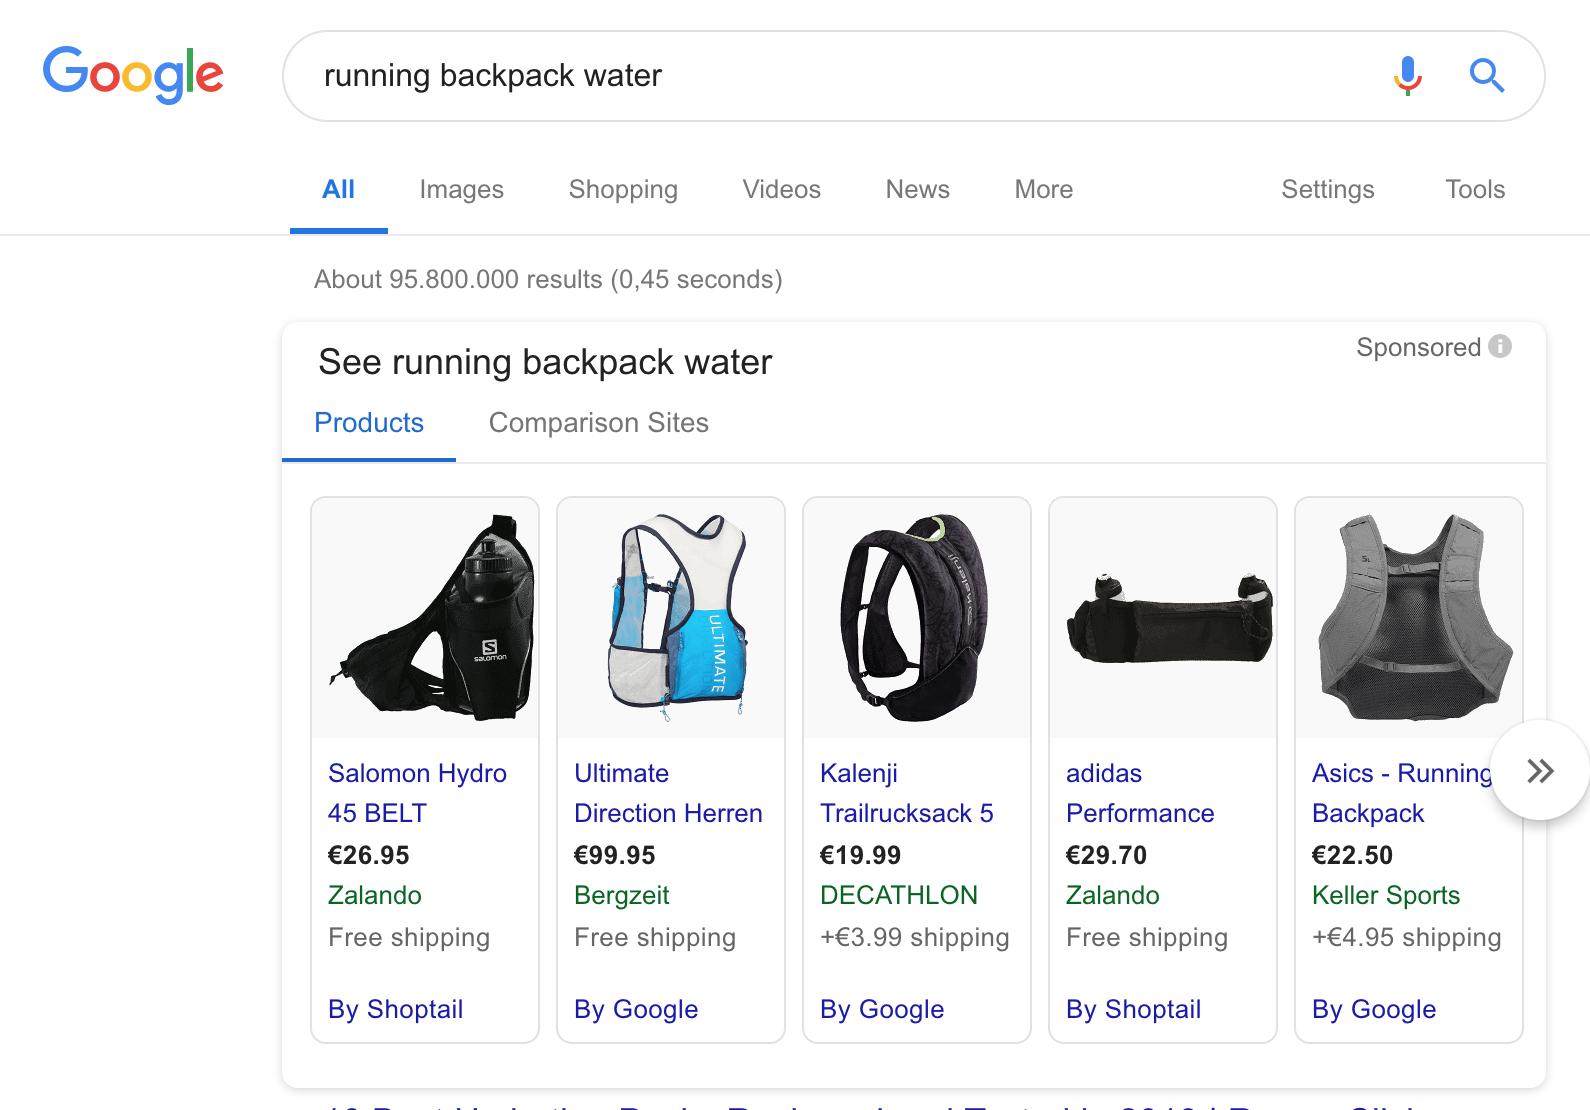 running backpack water keyword used for brand awareness